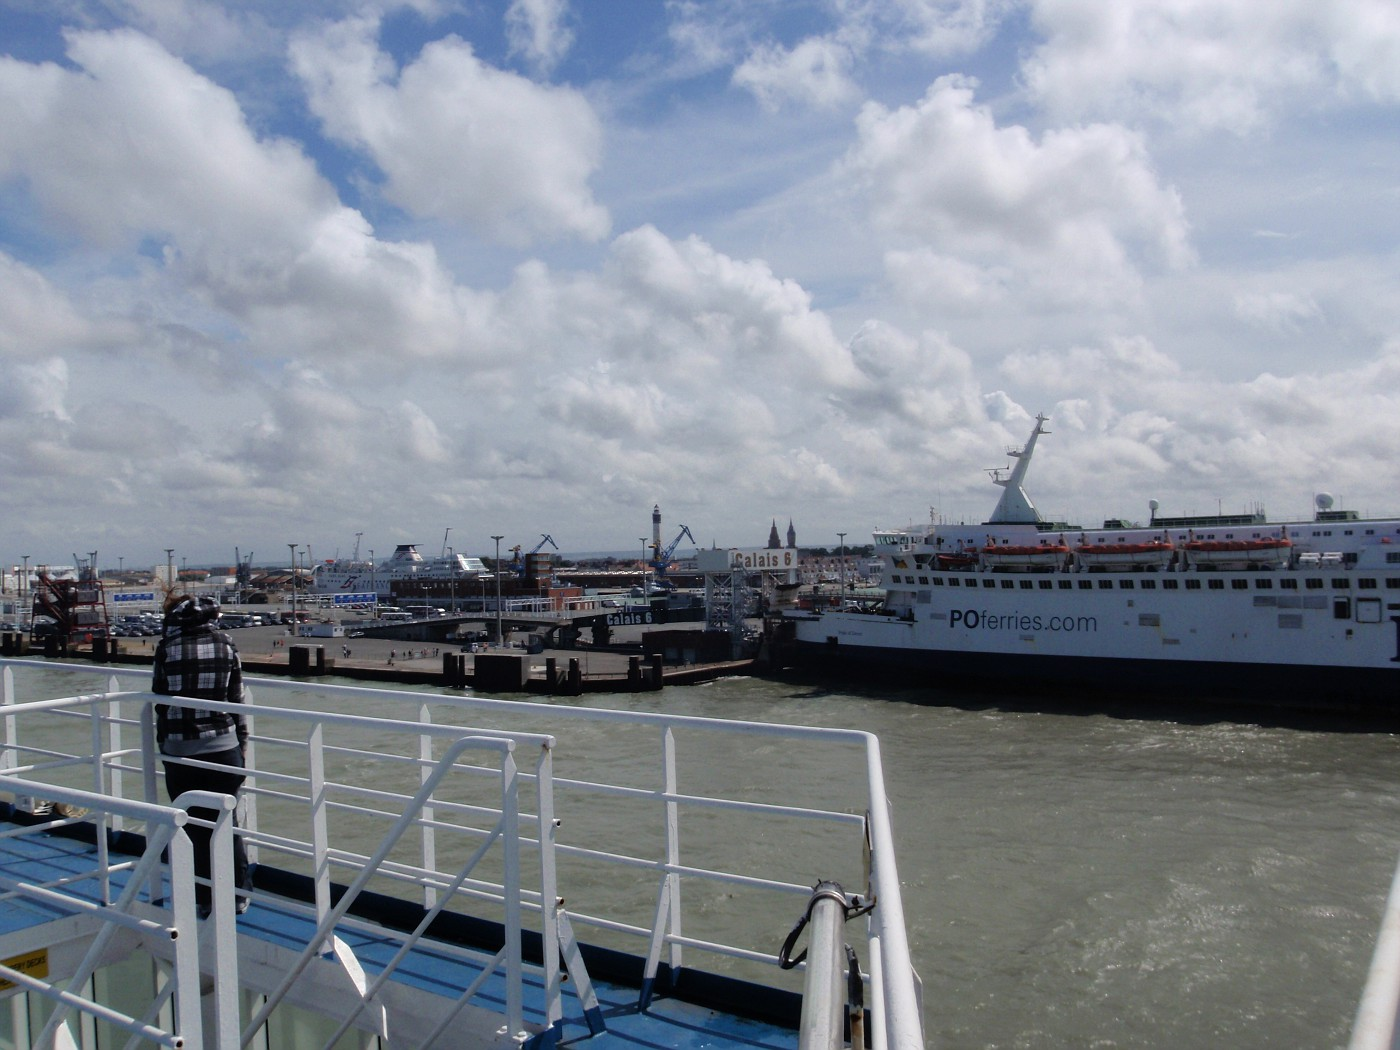 Harbour of Calais